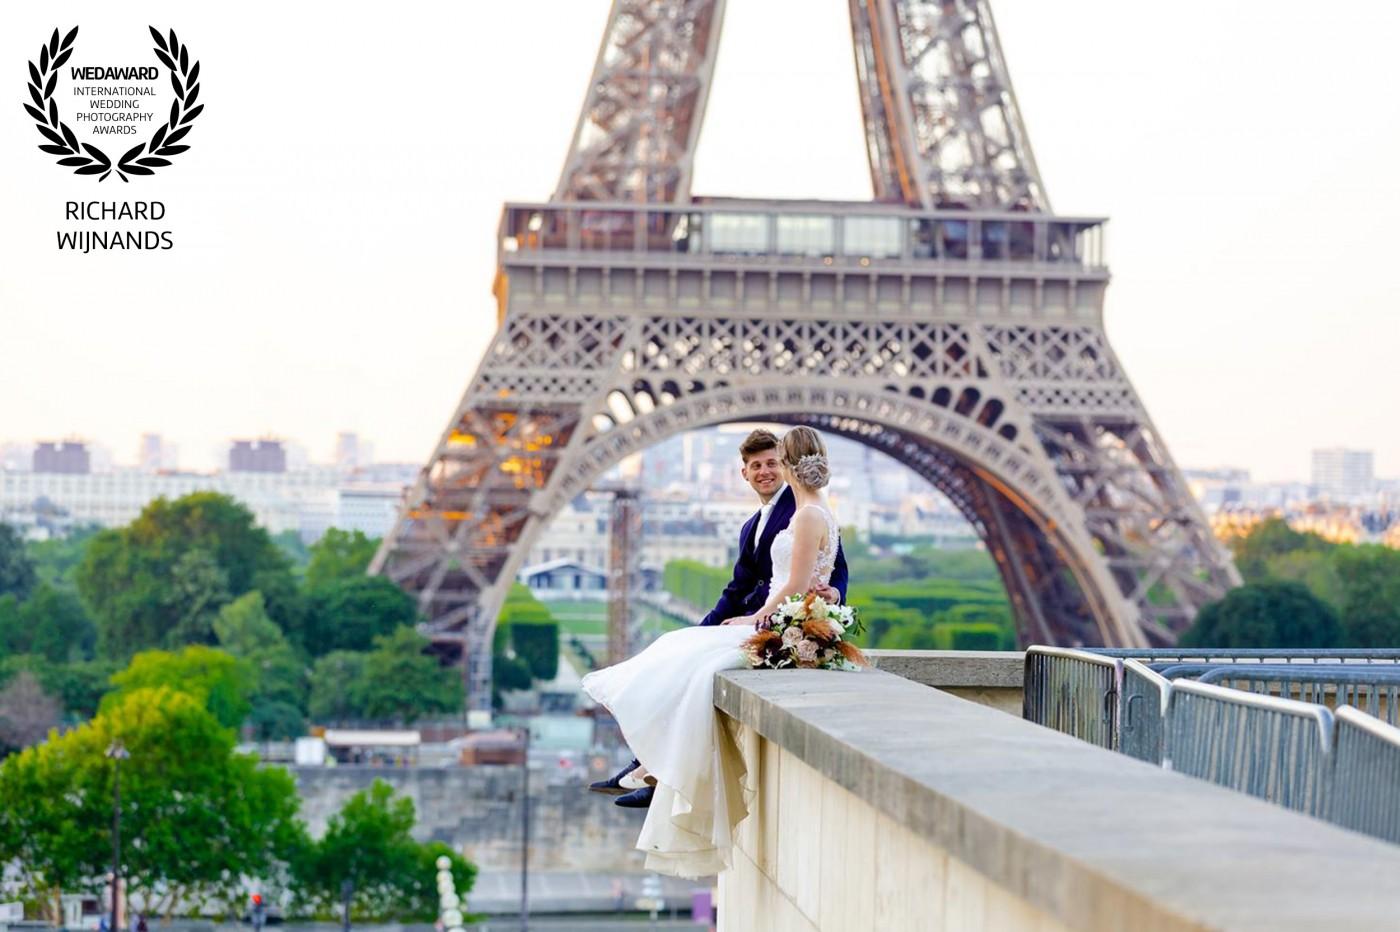 Bruidsfotograaf Urmond